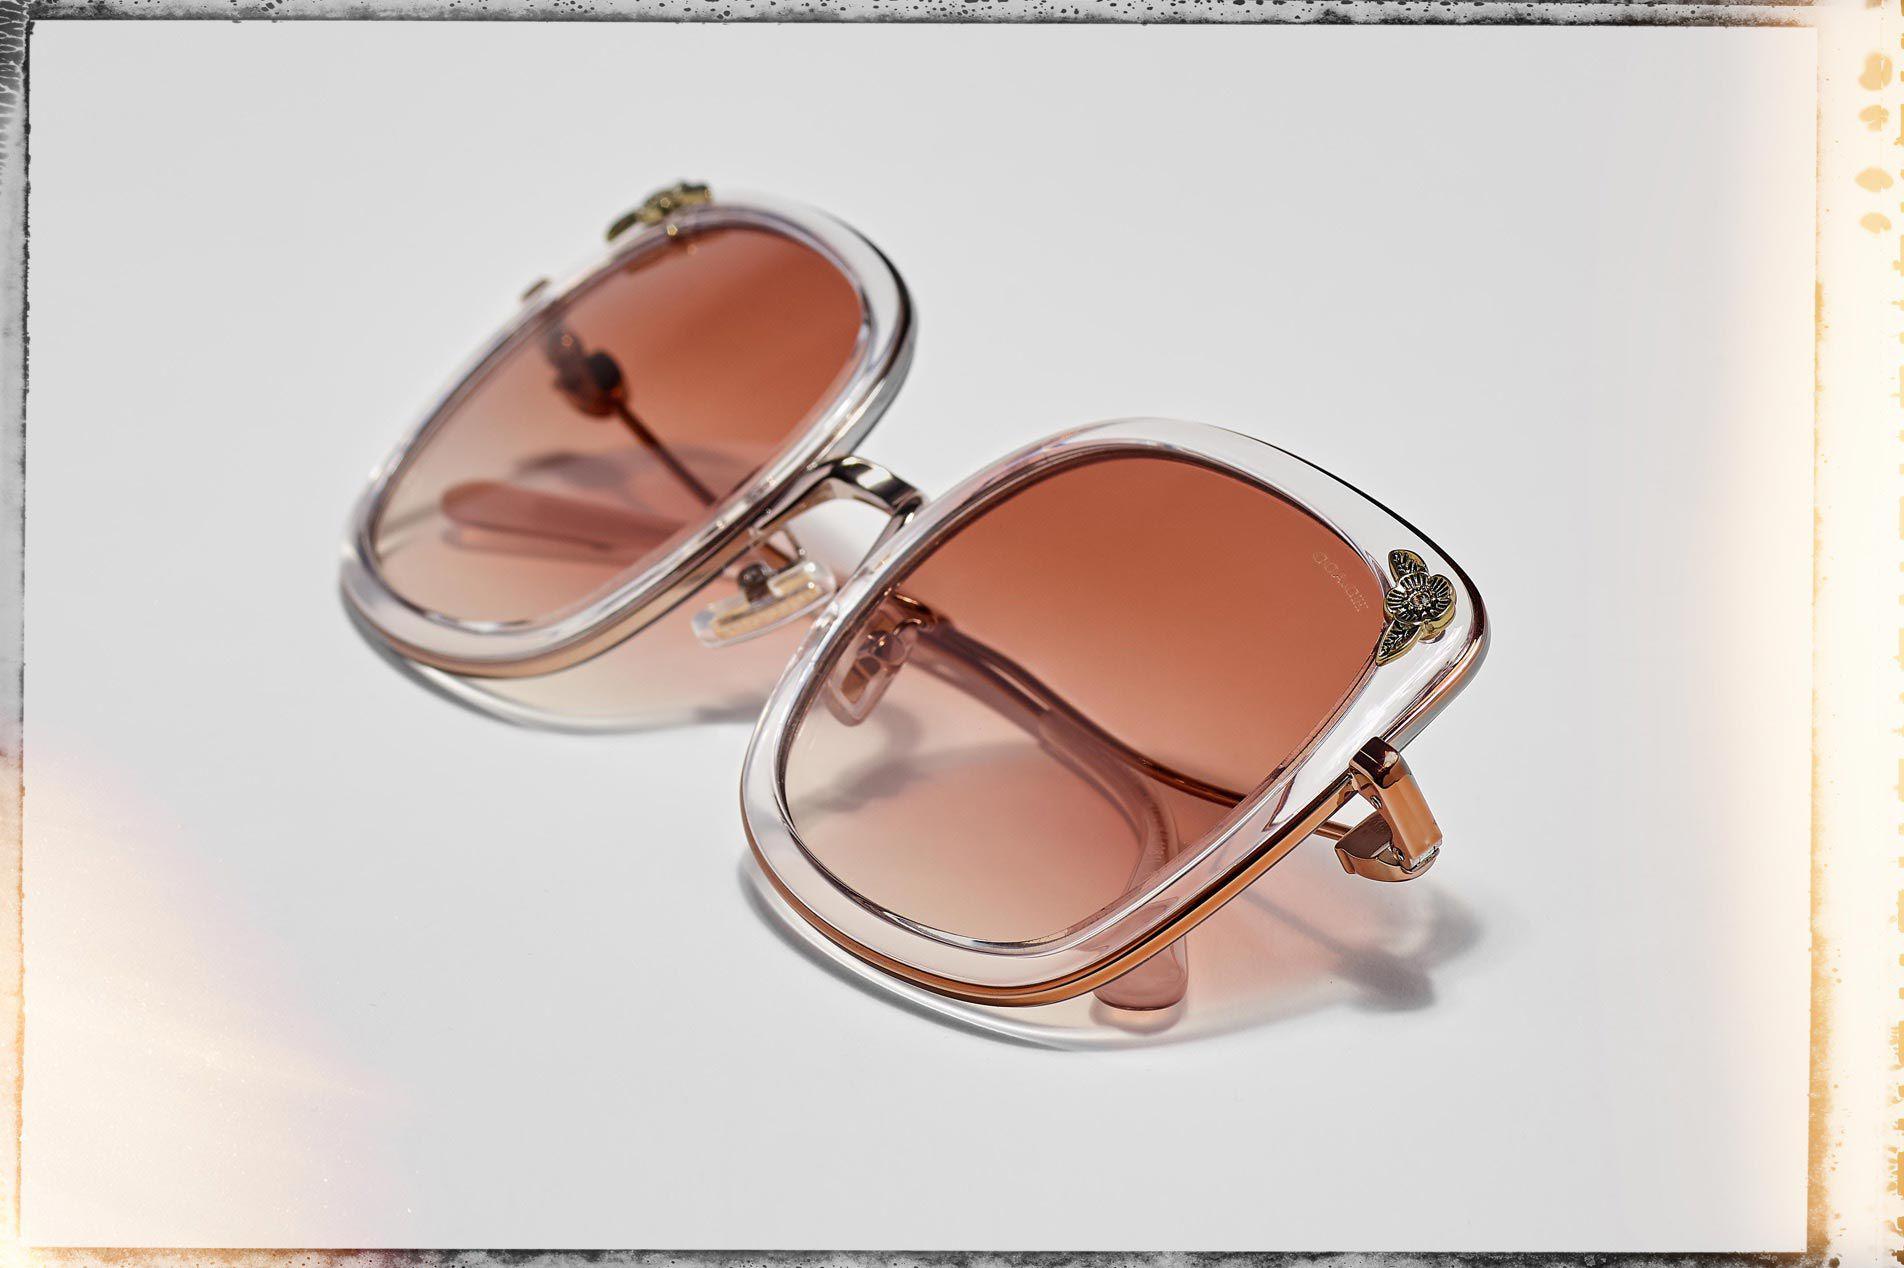 bbe5e4639d8 Trending Sunglasses for Women - Logomania